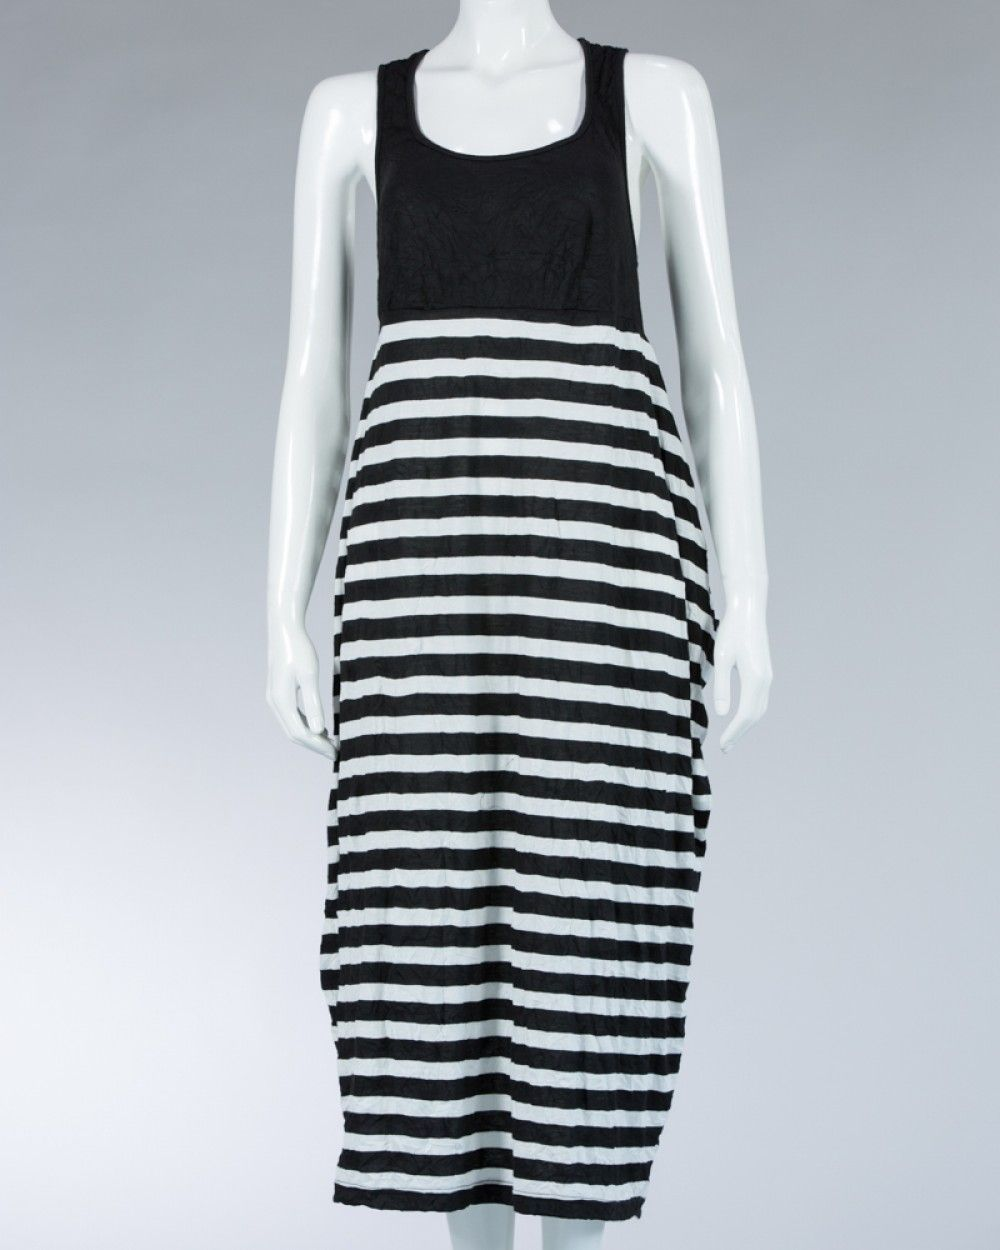 Animale ladies long dress striped motif - Black #WomenDress #Dress #SummerDress #Animale #WomenWear #WomenFashion #MotifDress #LightDress